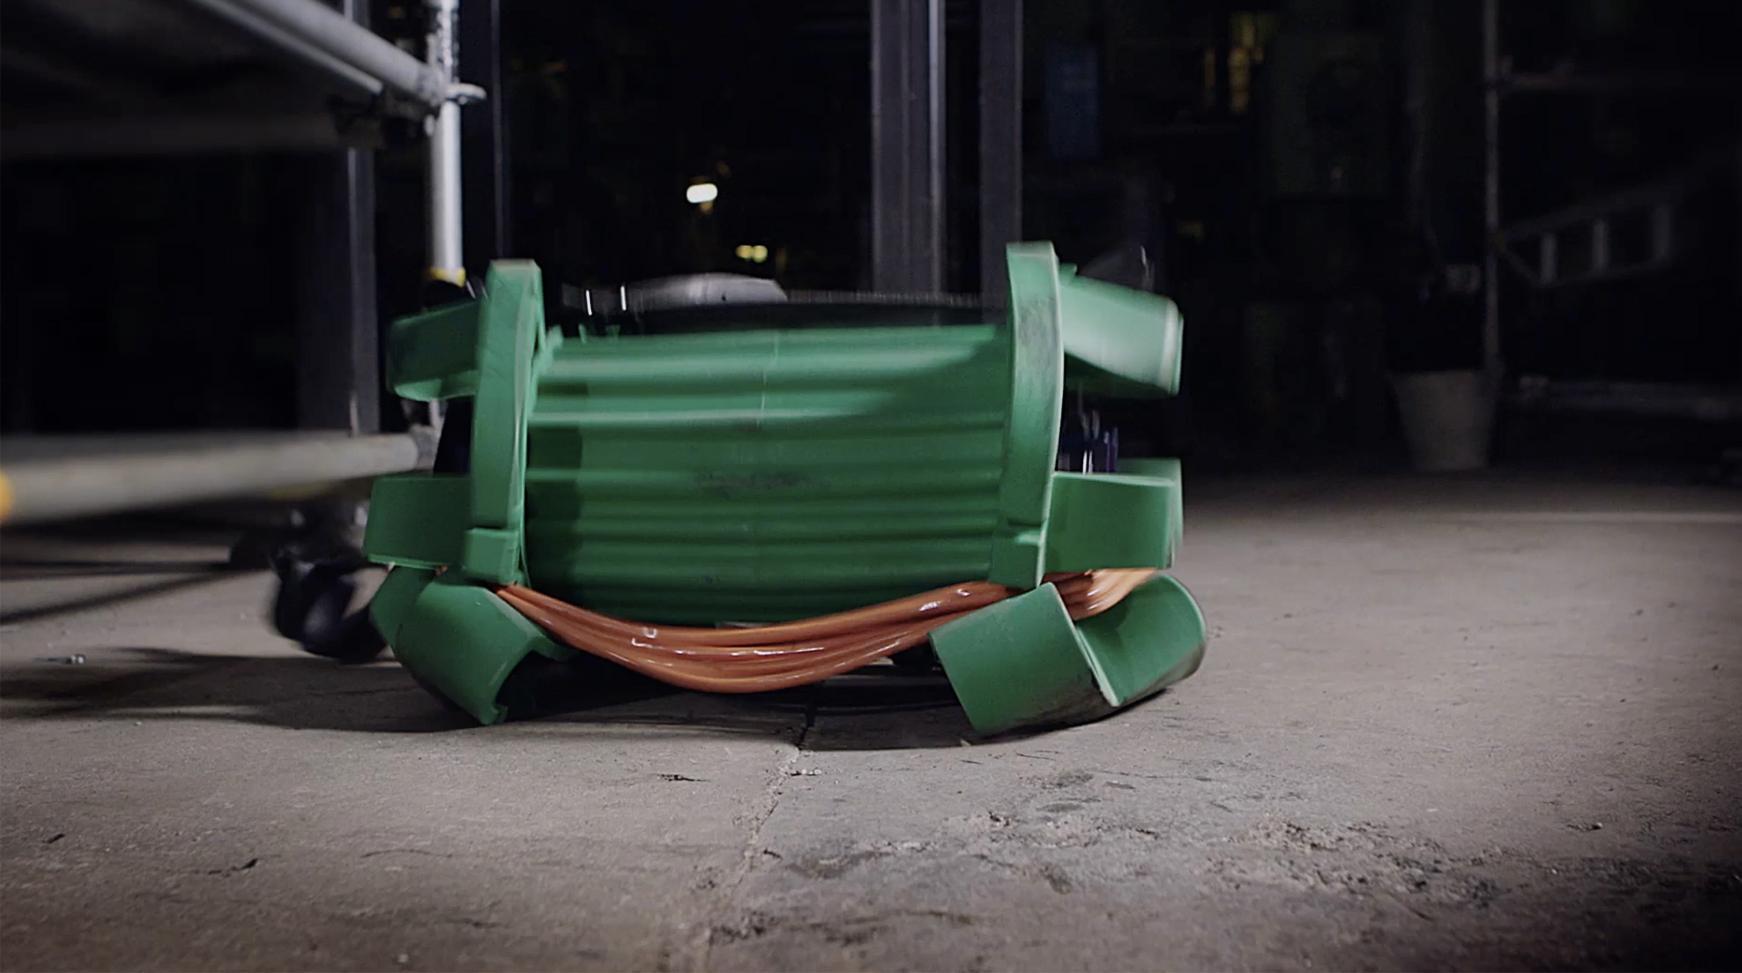 SLAM Ex transformer in drop test-1